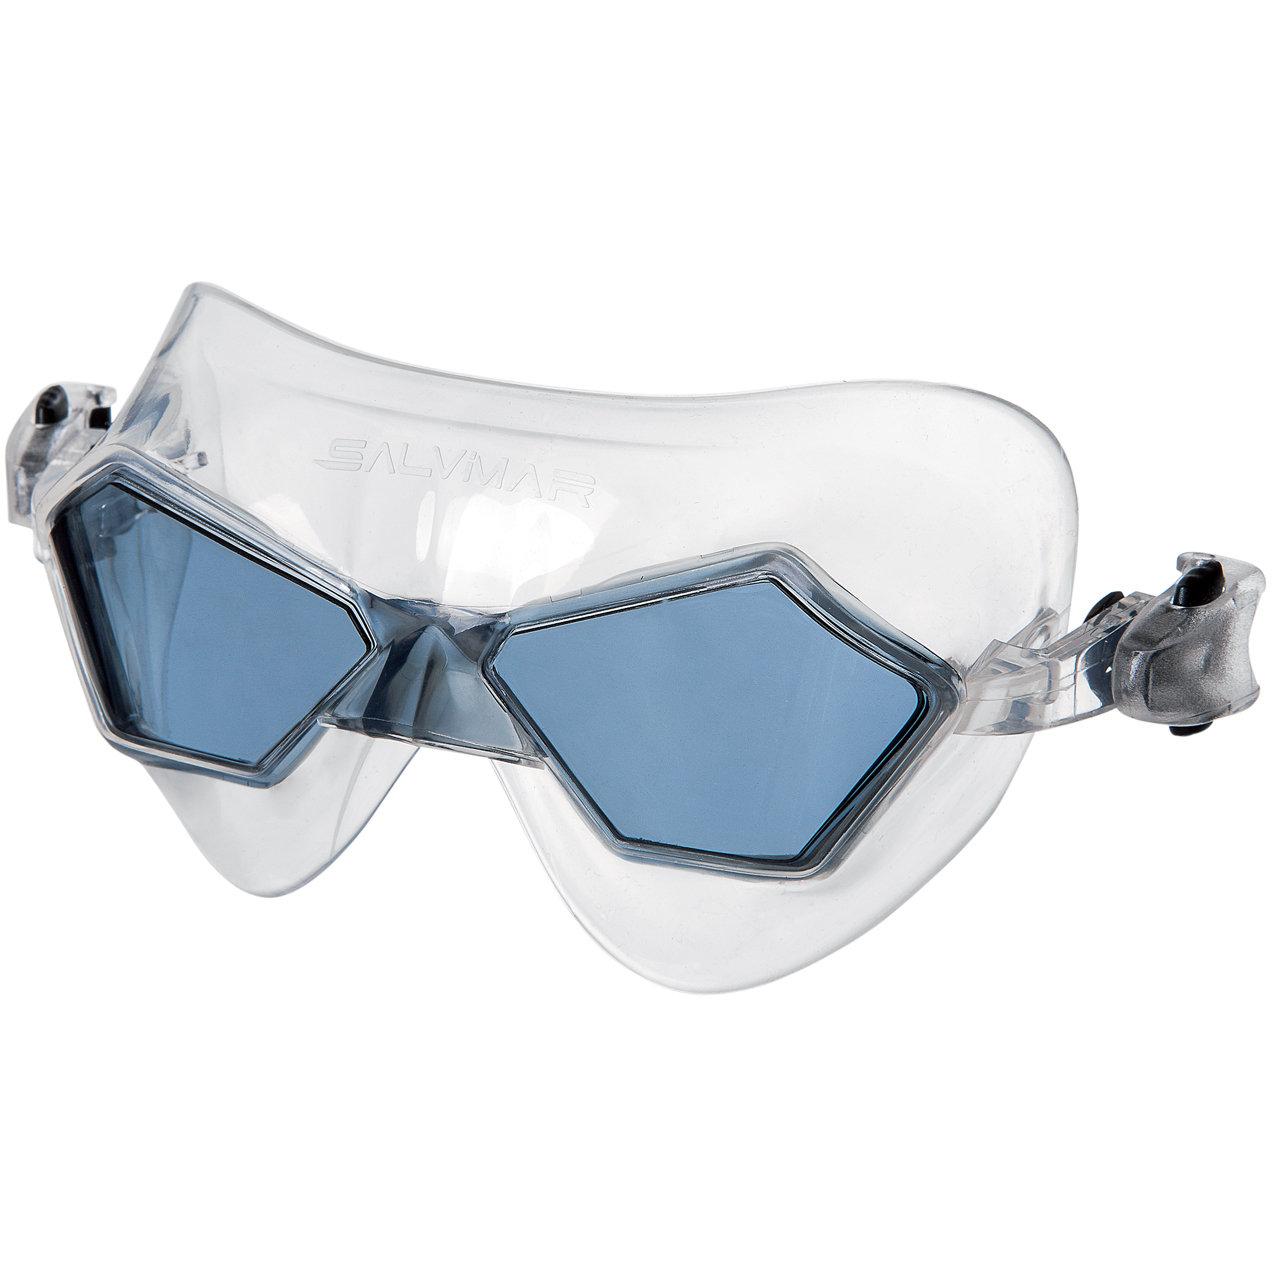 occhiali nuoto silicone Jeko